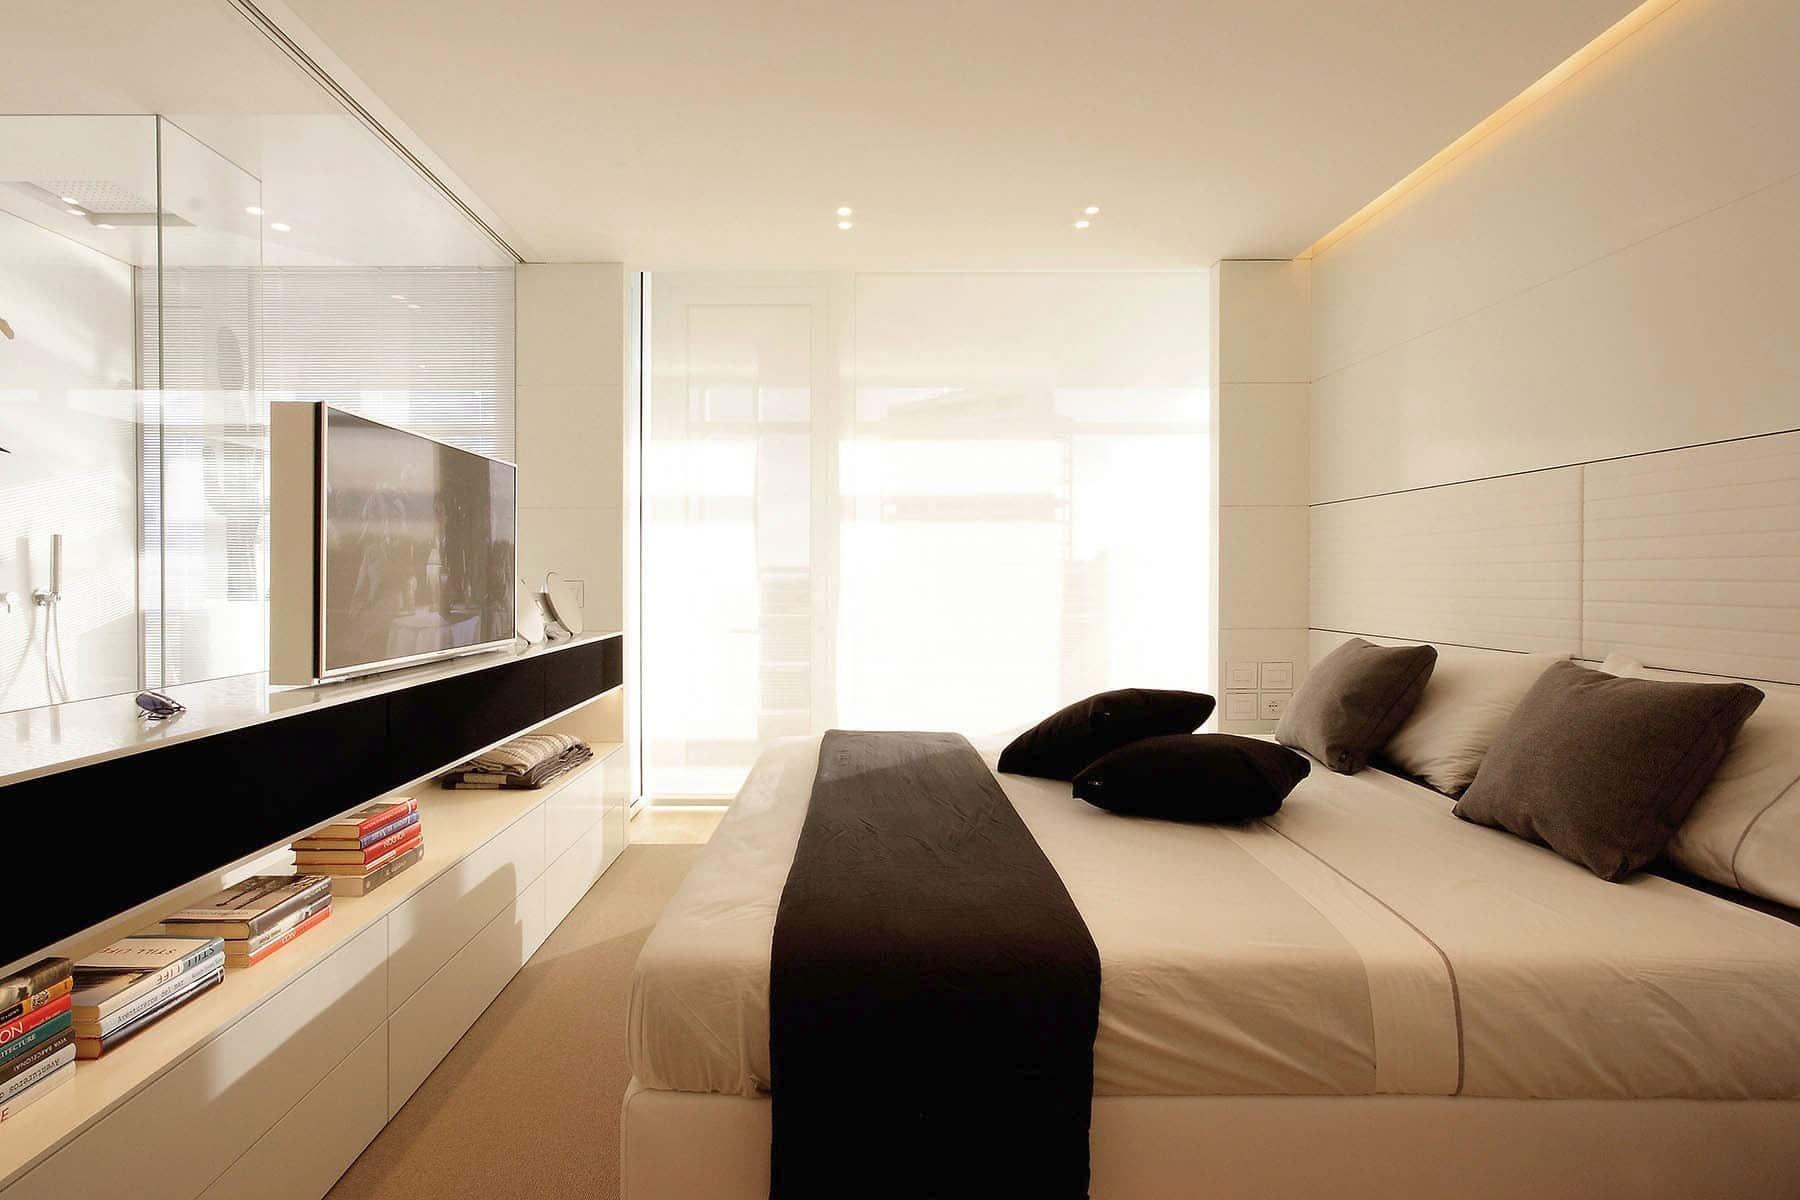 Plano departamento peque o dos dormitorios construye hogar - Dormitorio diseno moderno ...